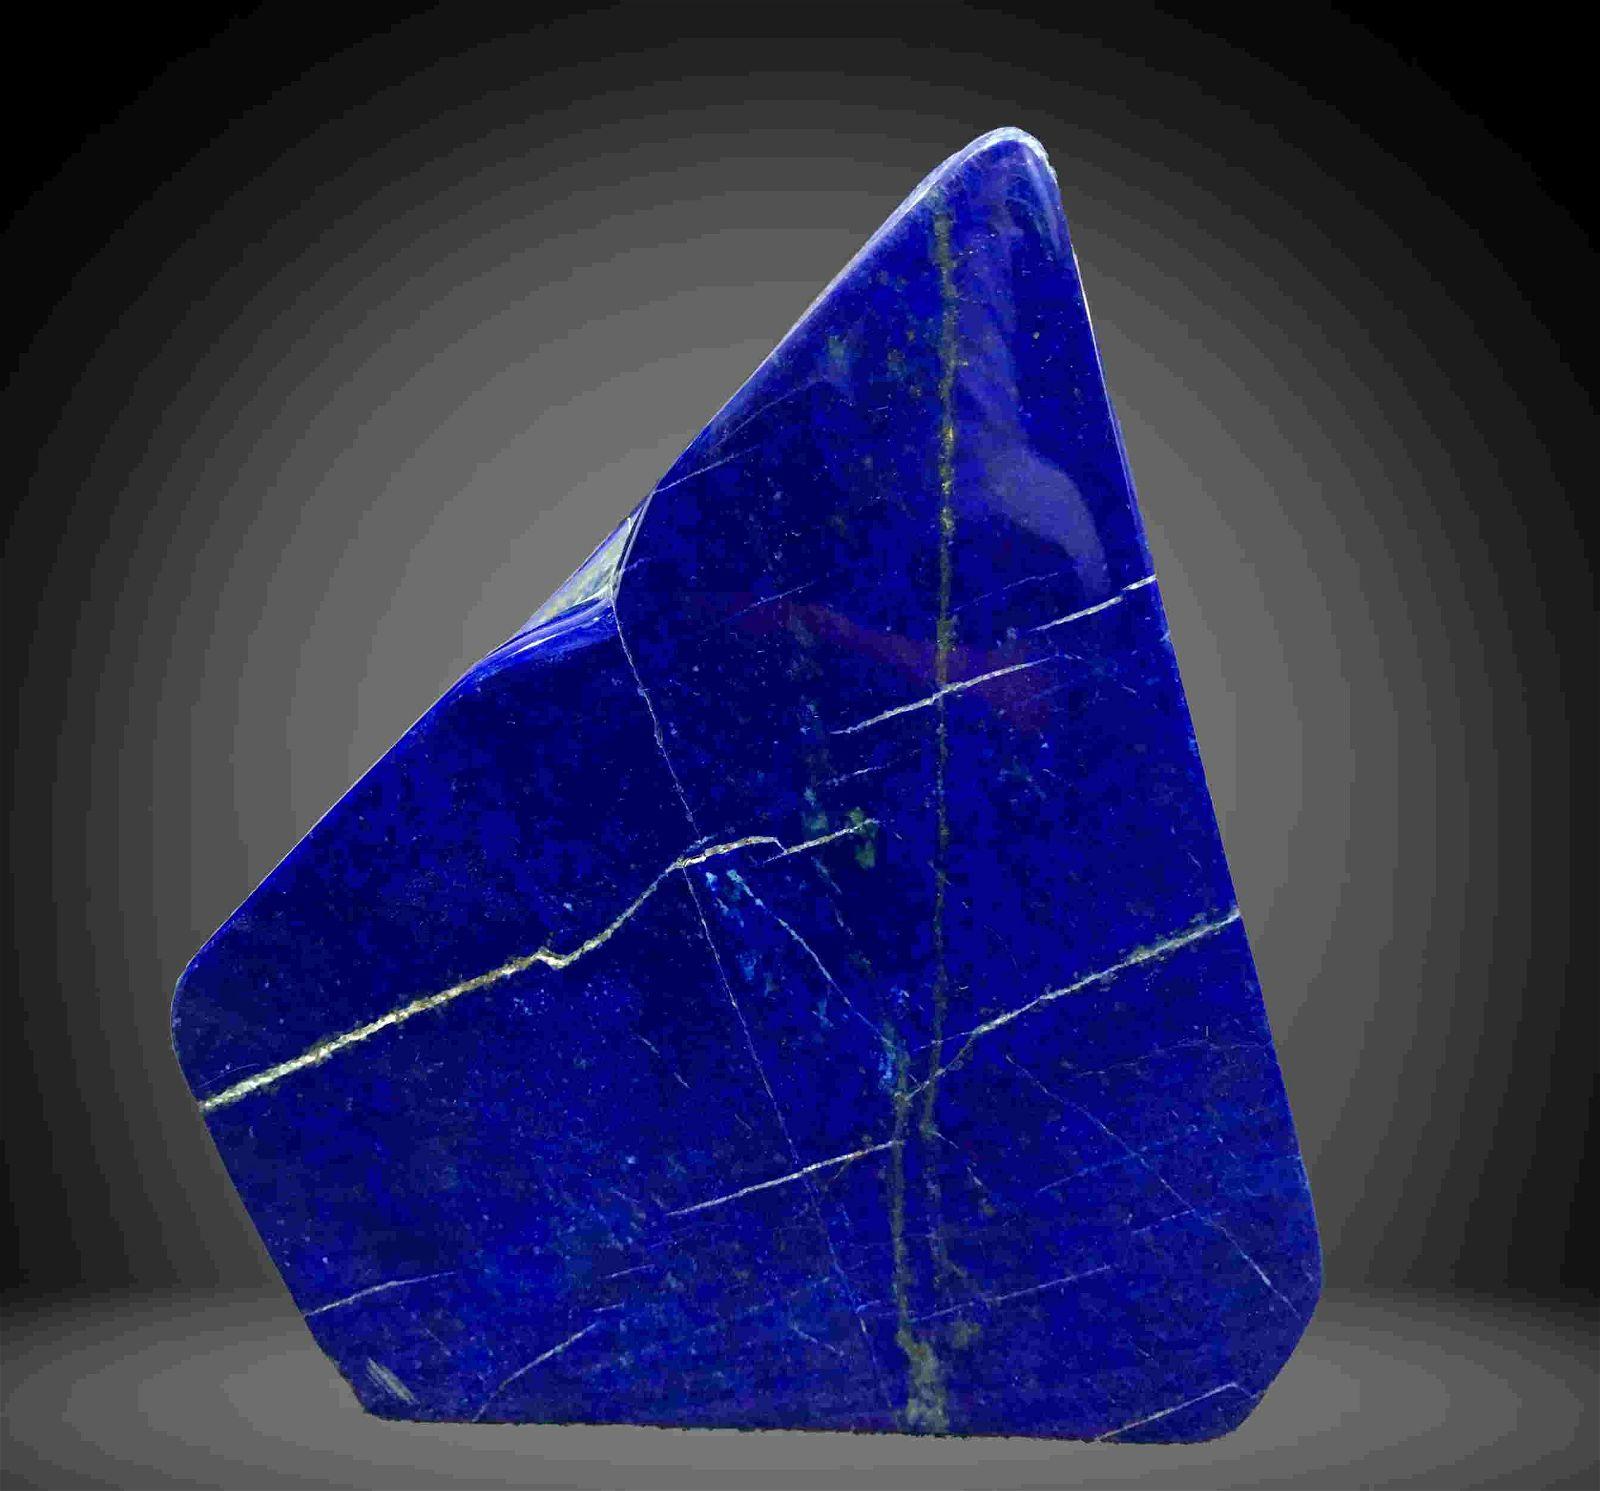 AAA Quality 1.2 Kg Vintage,Royal Blue Lapis Lazuli